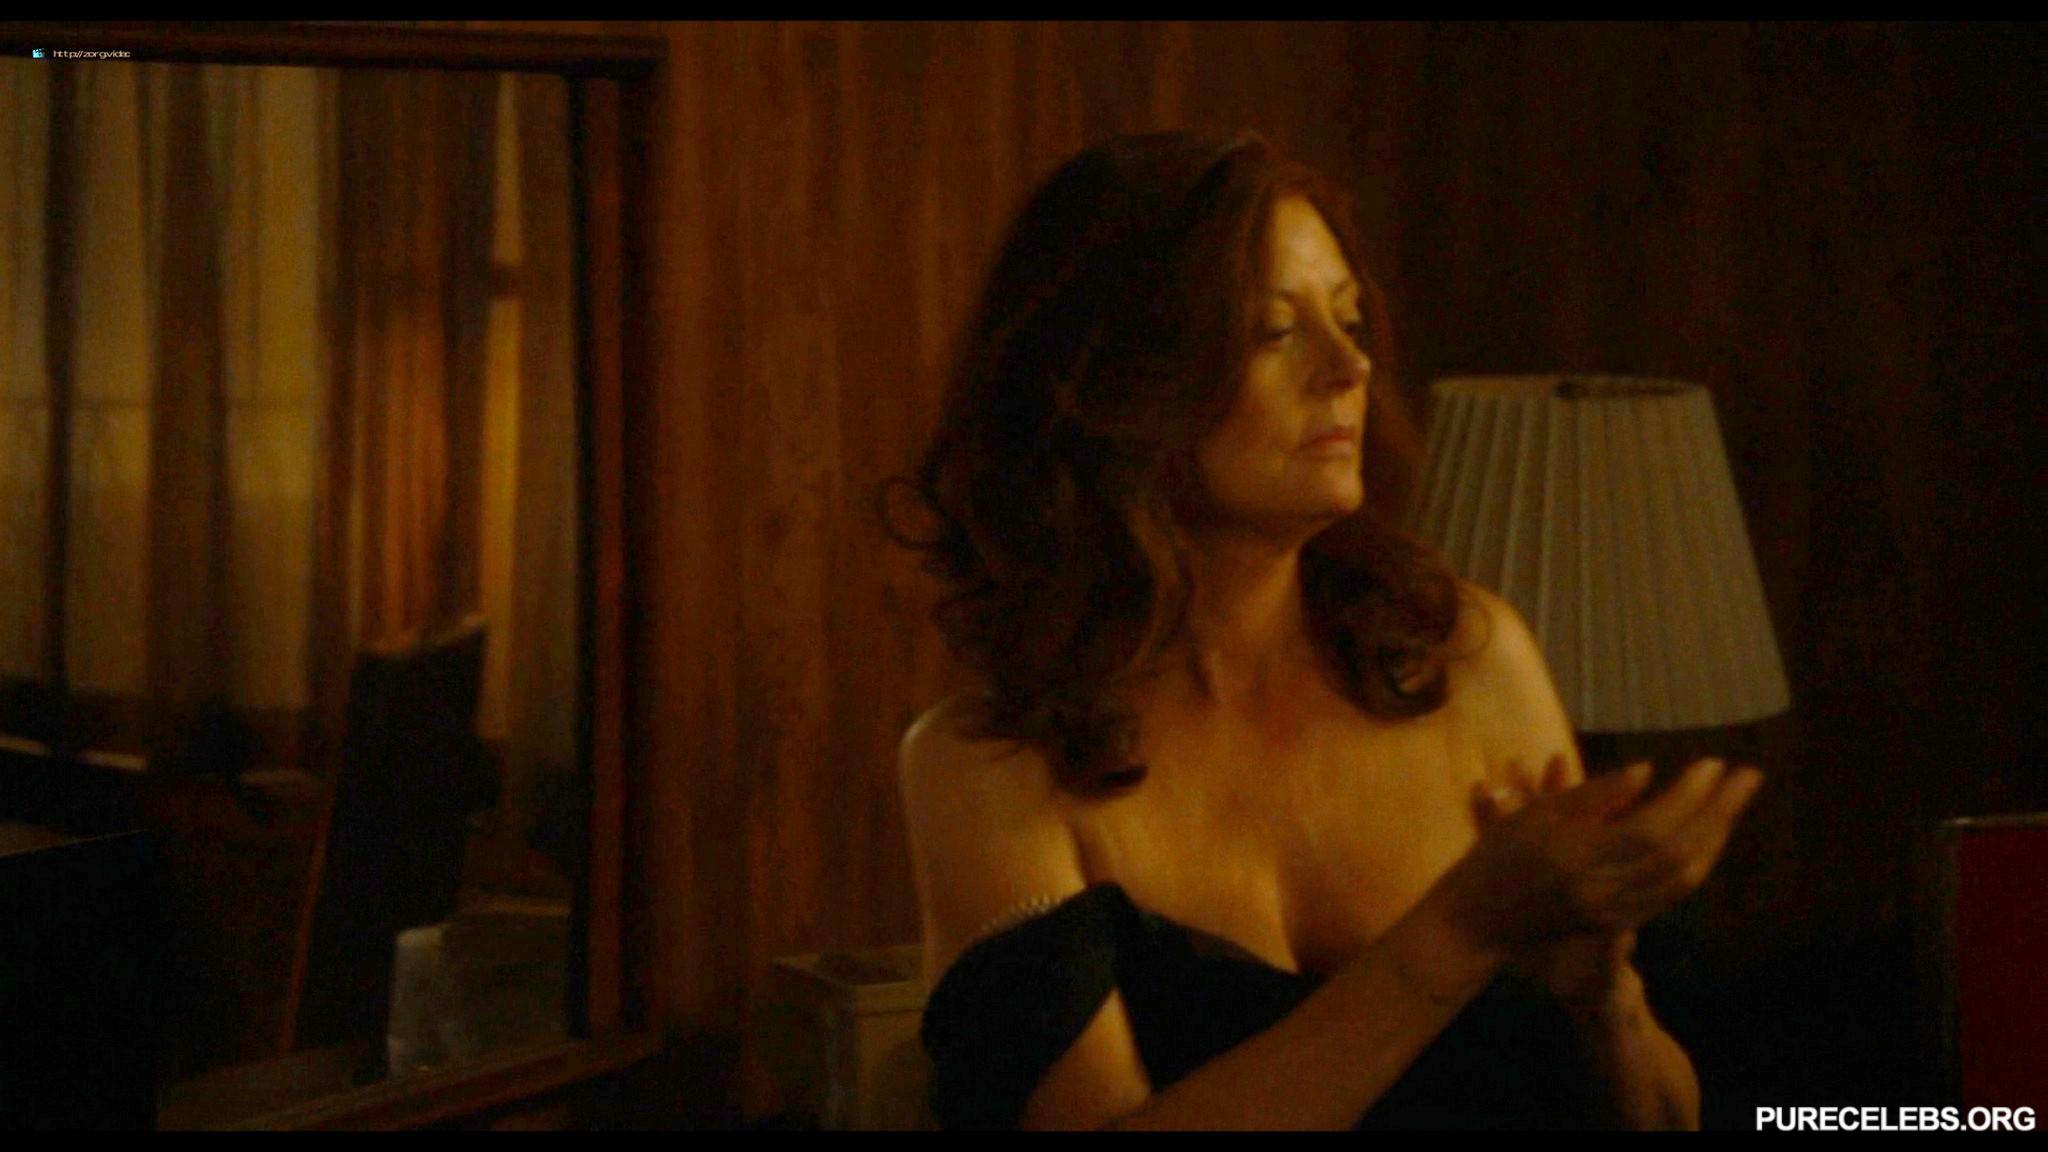 Boobs Susan Sarandon Free Nude Pictures Jpg